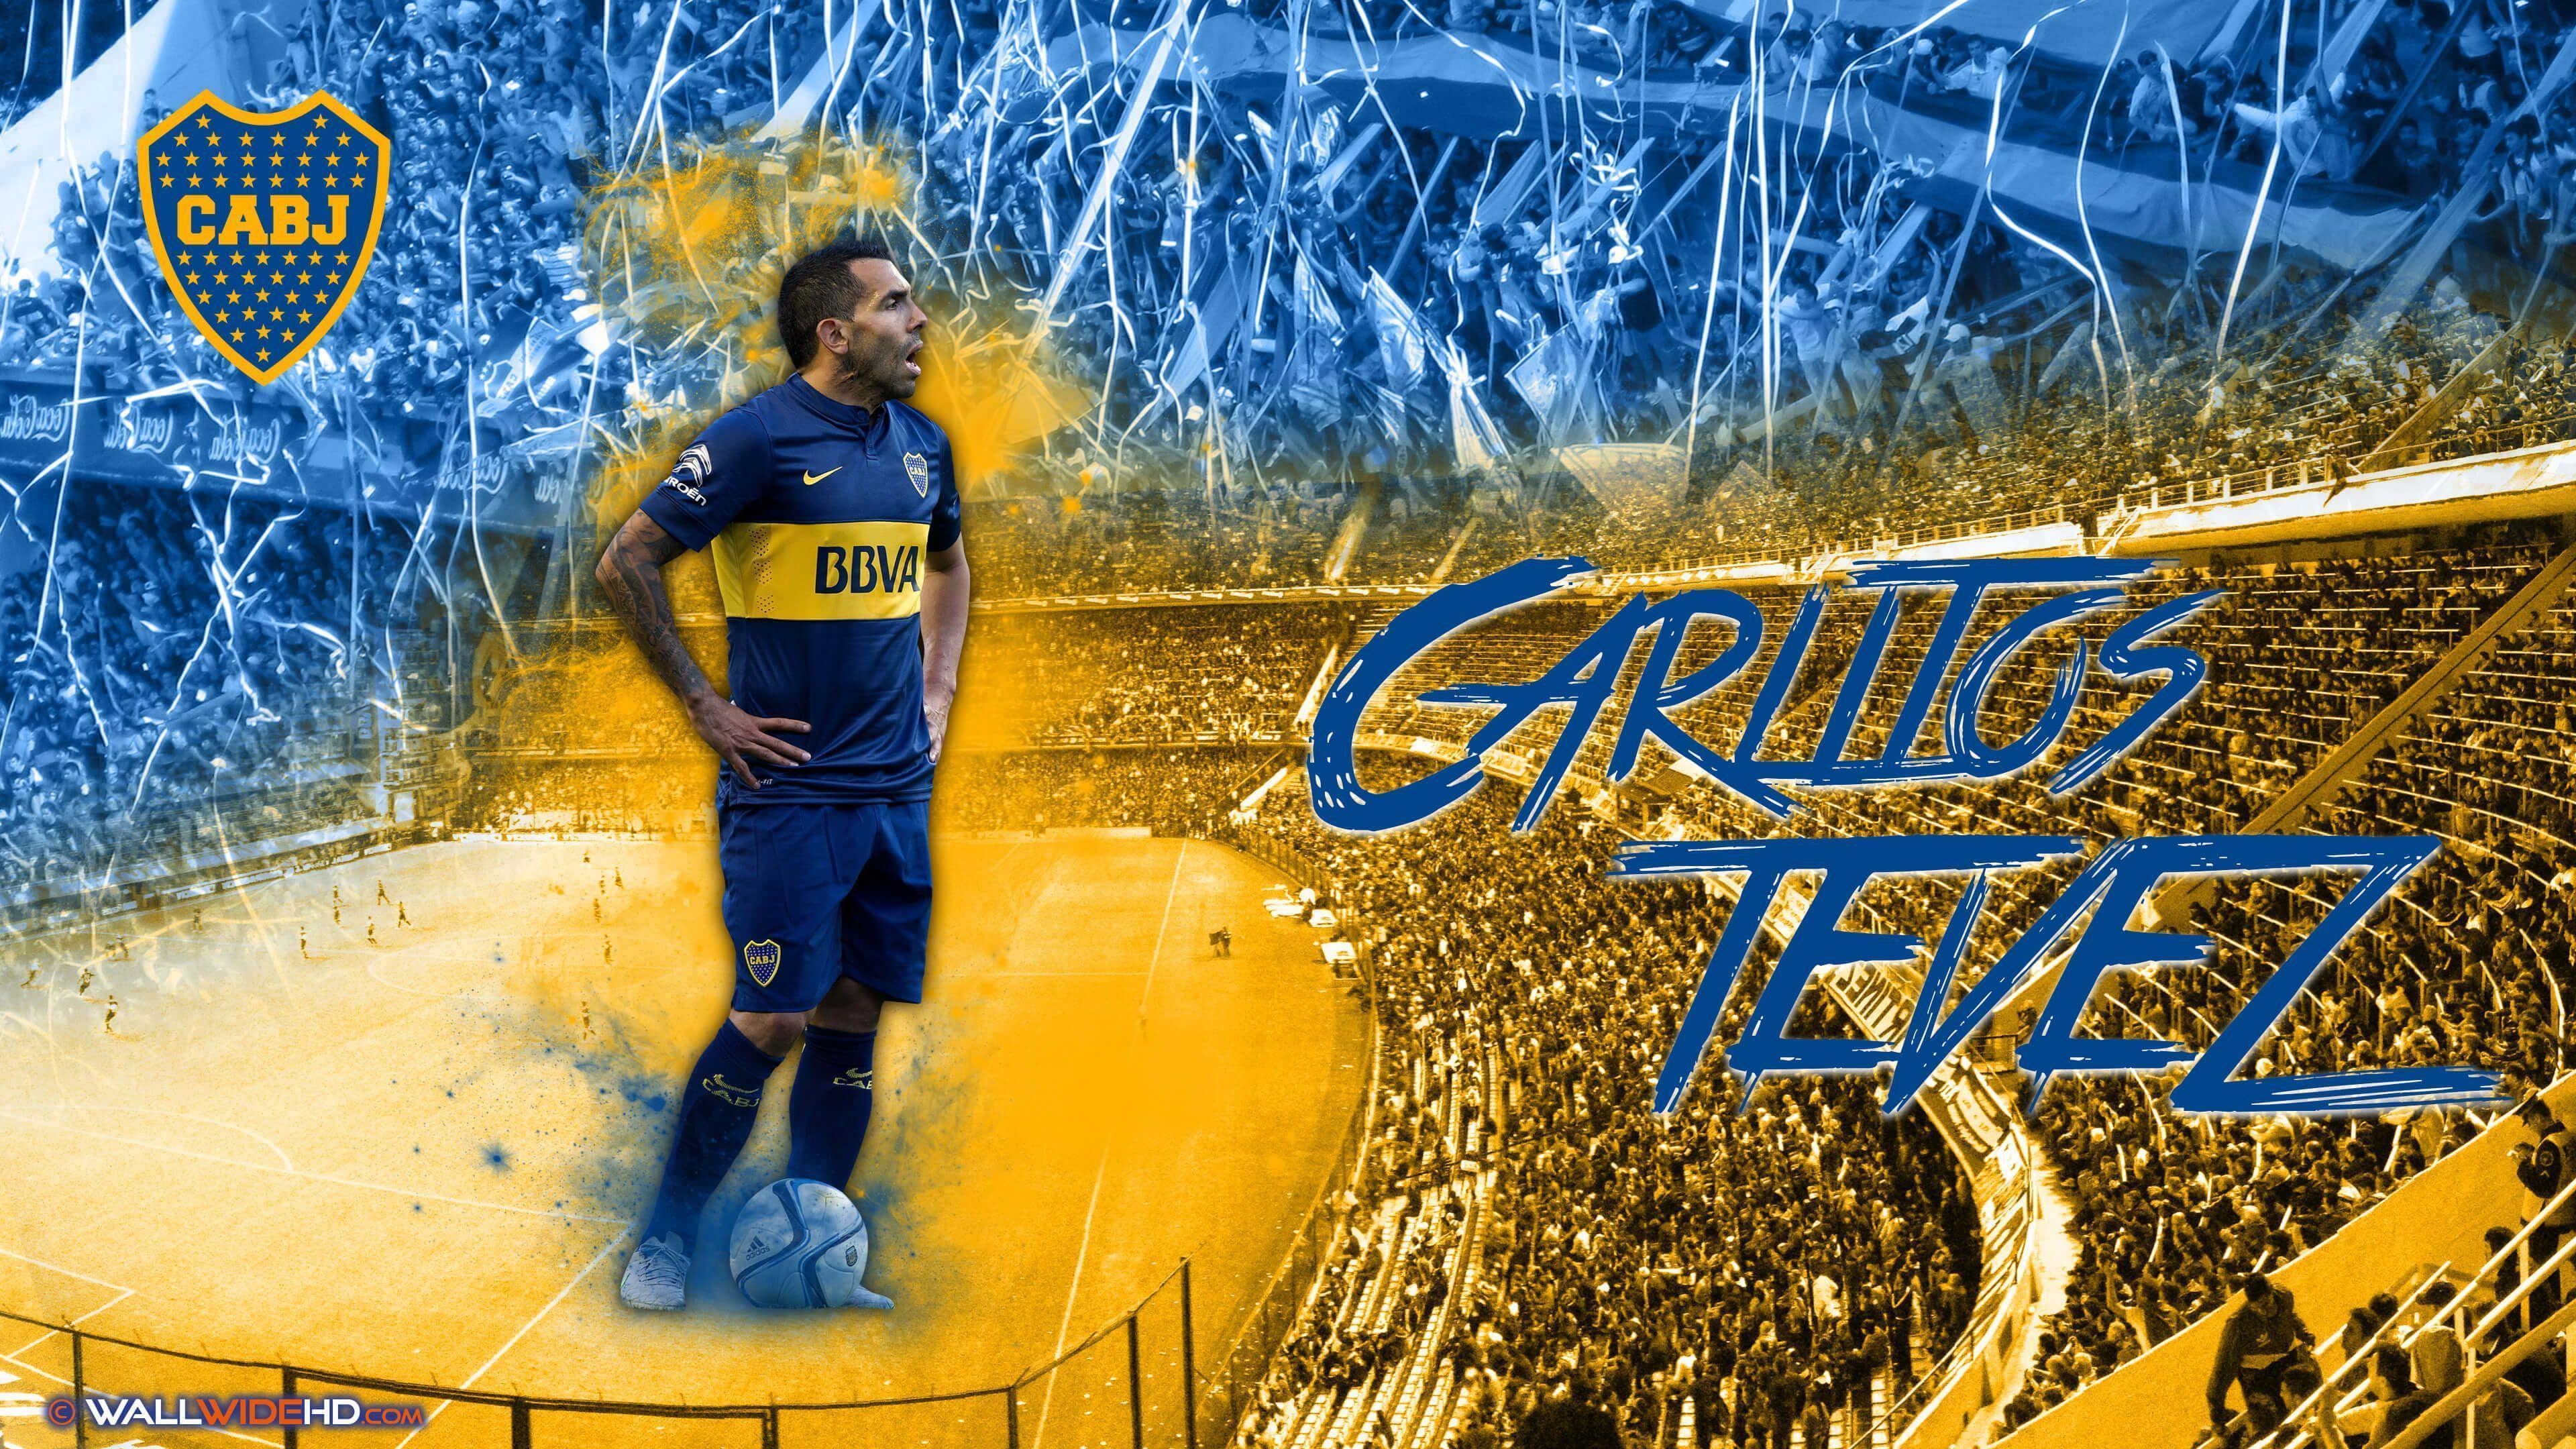 Imagenes De Carlos Tevez En Boca Junior Hd Imagenes De: Boca Juniors HD Wallpapers